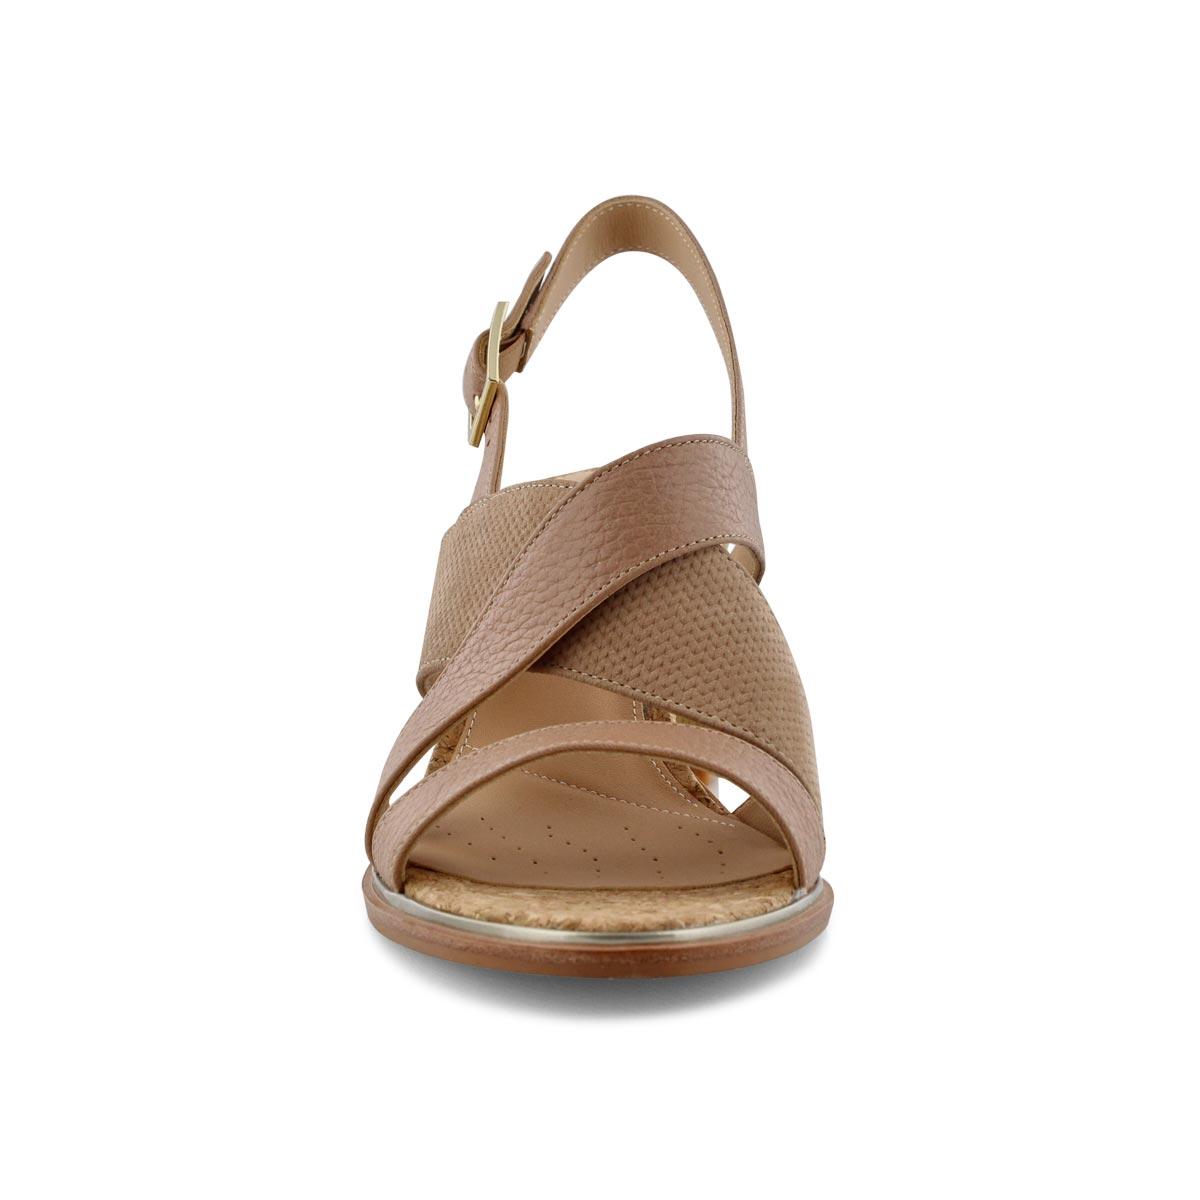 79c0ecafa7e Clarks Women s ELLIS TILDA nude dress sandal